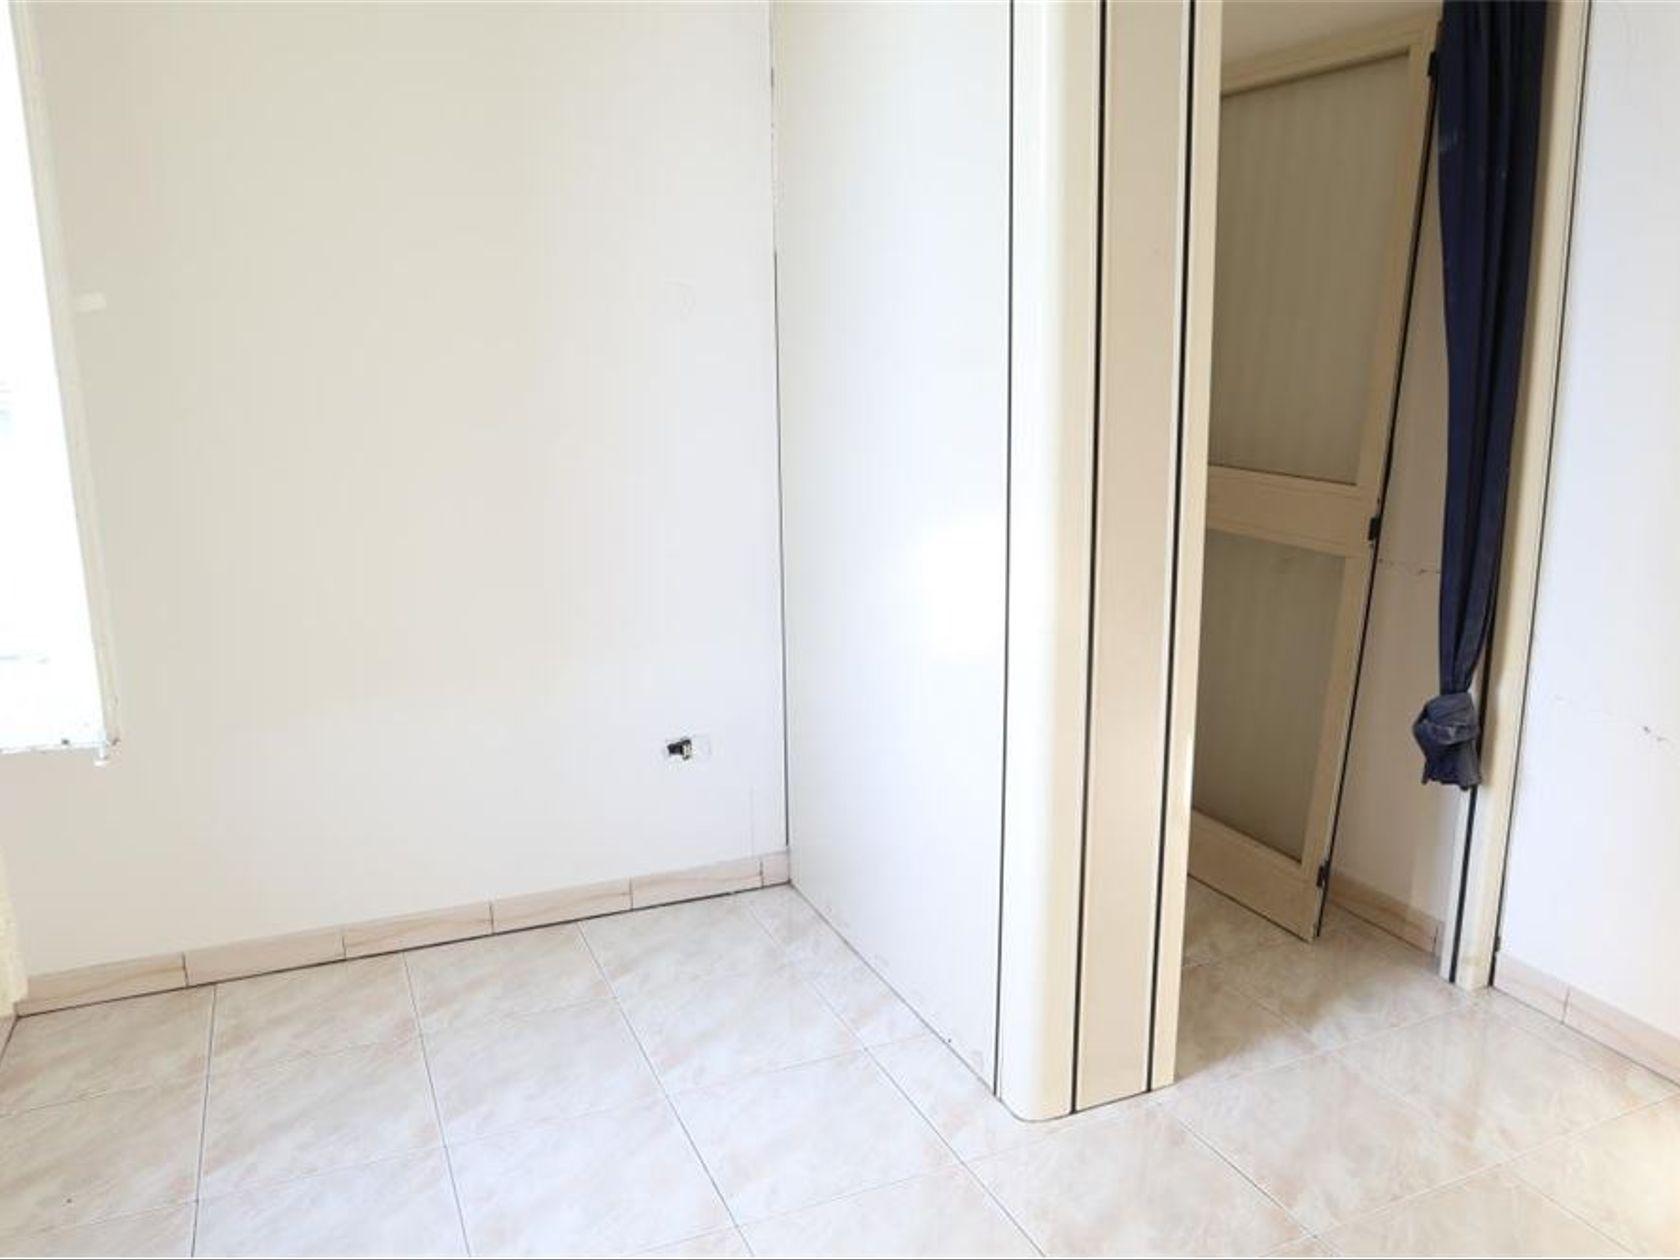 Appartamento Pescara-colle Marino, Pescara, PE Vendita - Foto 6